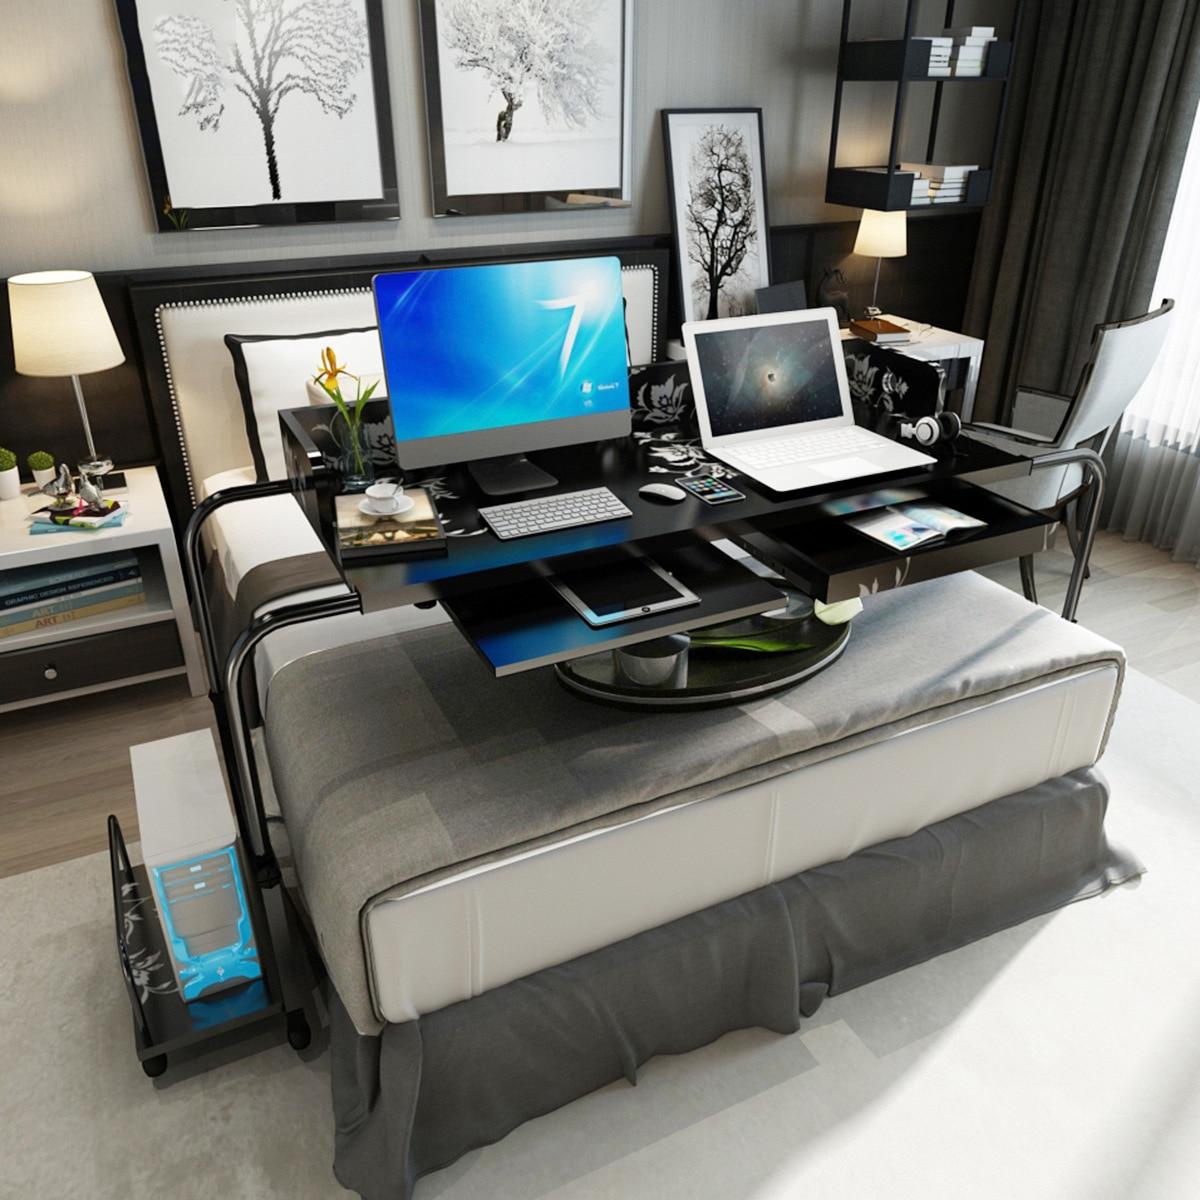 Astounding 9 Lk380 Creative Widenheight Adjustable Laptop Stand Cross Download Free Architecture Designs Rallybritishbridgeorg